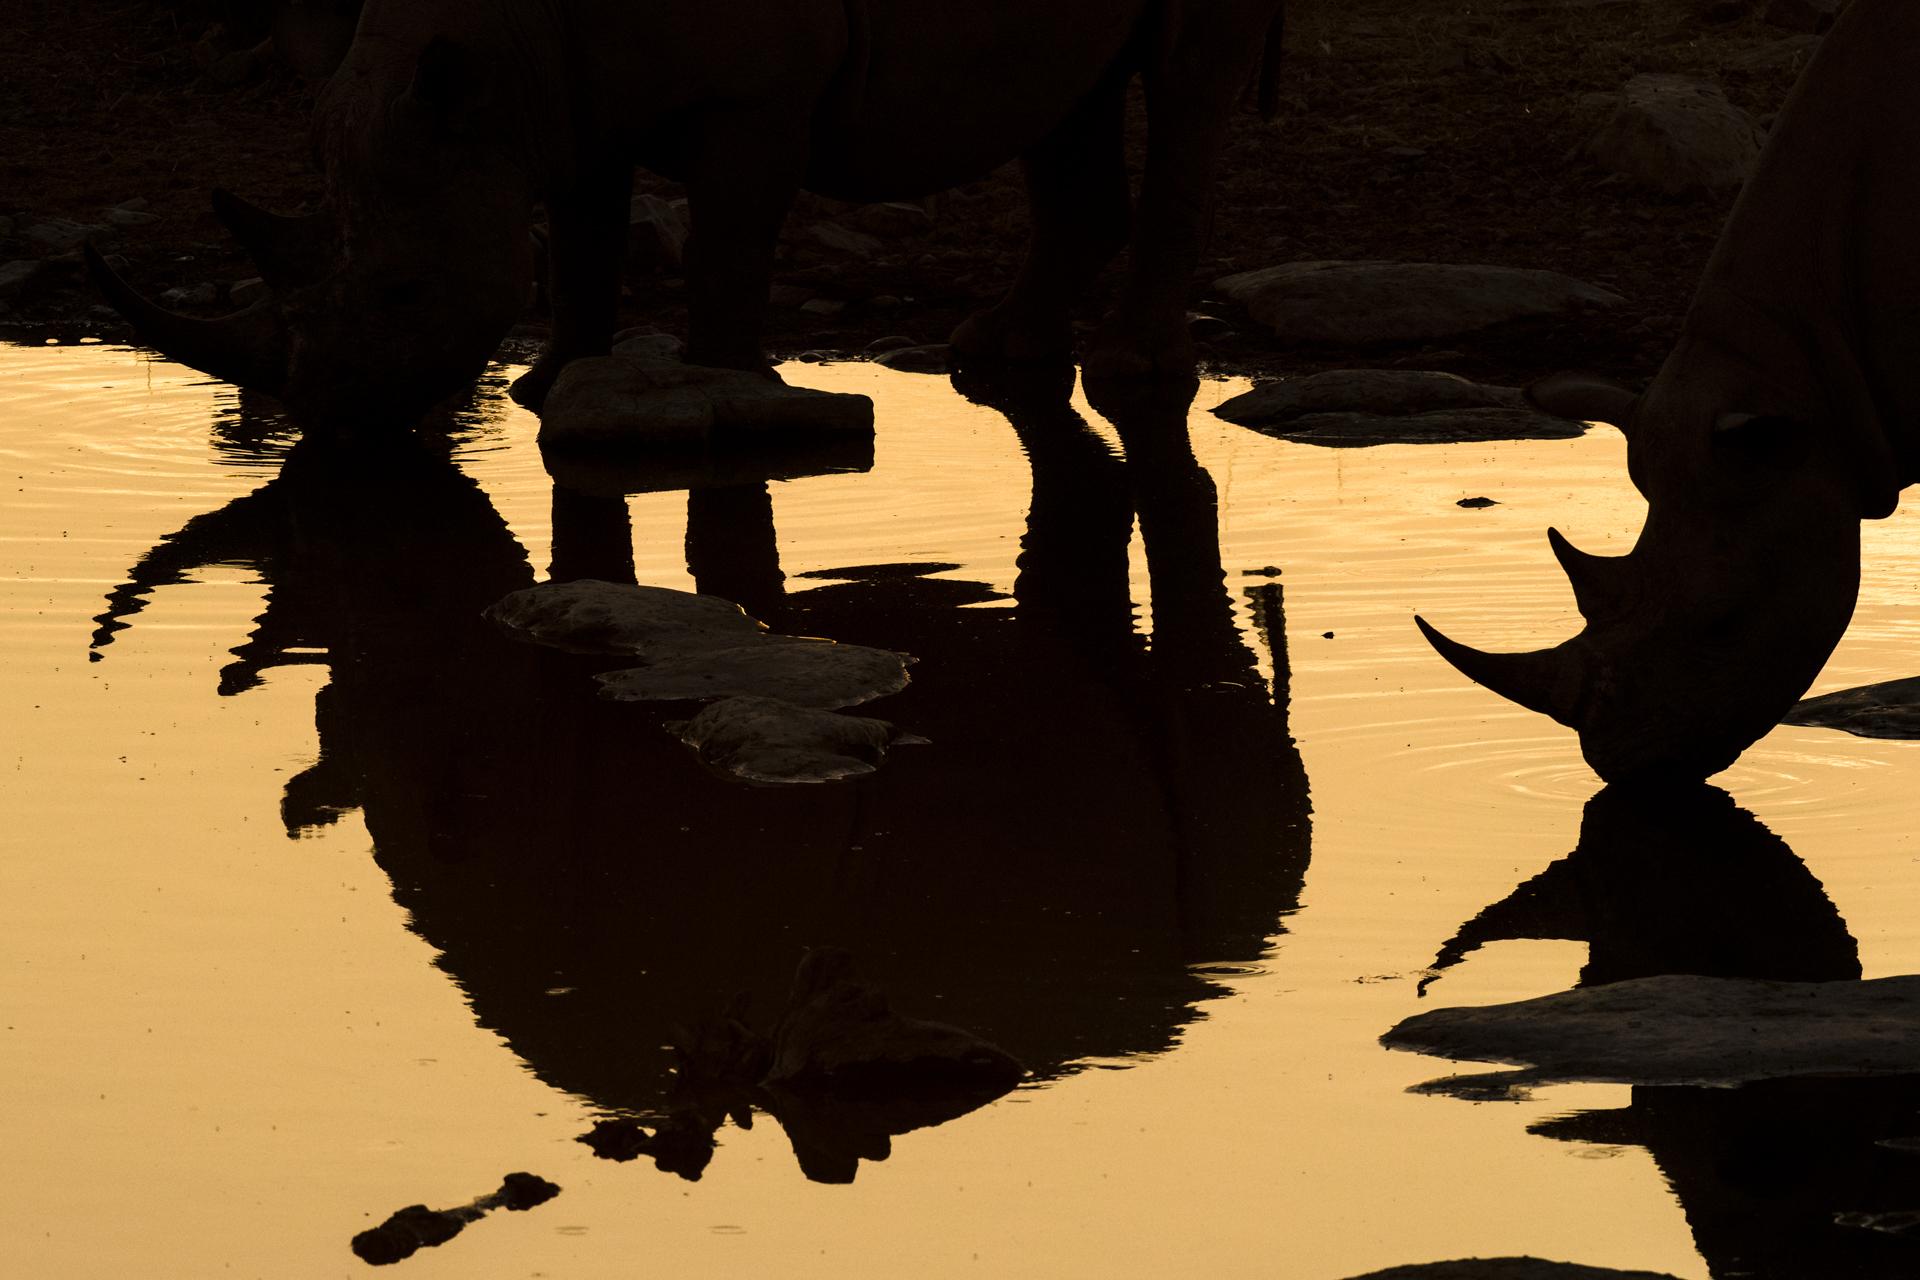 Le silhouette (una riflessa) di due individui di rinoceronte nero mentre si abbeverano nell'Etosha National Park, Namibia. Reversed image of two black rhinos (Diceros bicornis) drinking at a water hole at dusk. Etosha National Park, Namibia